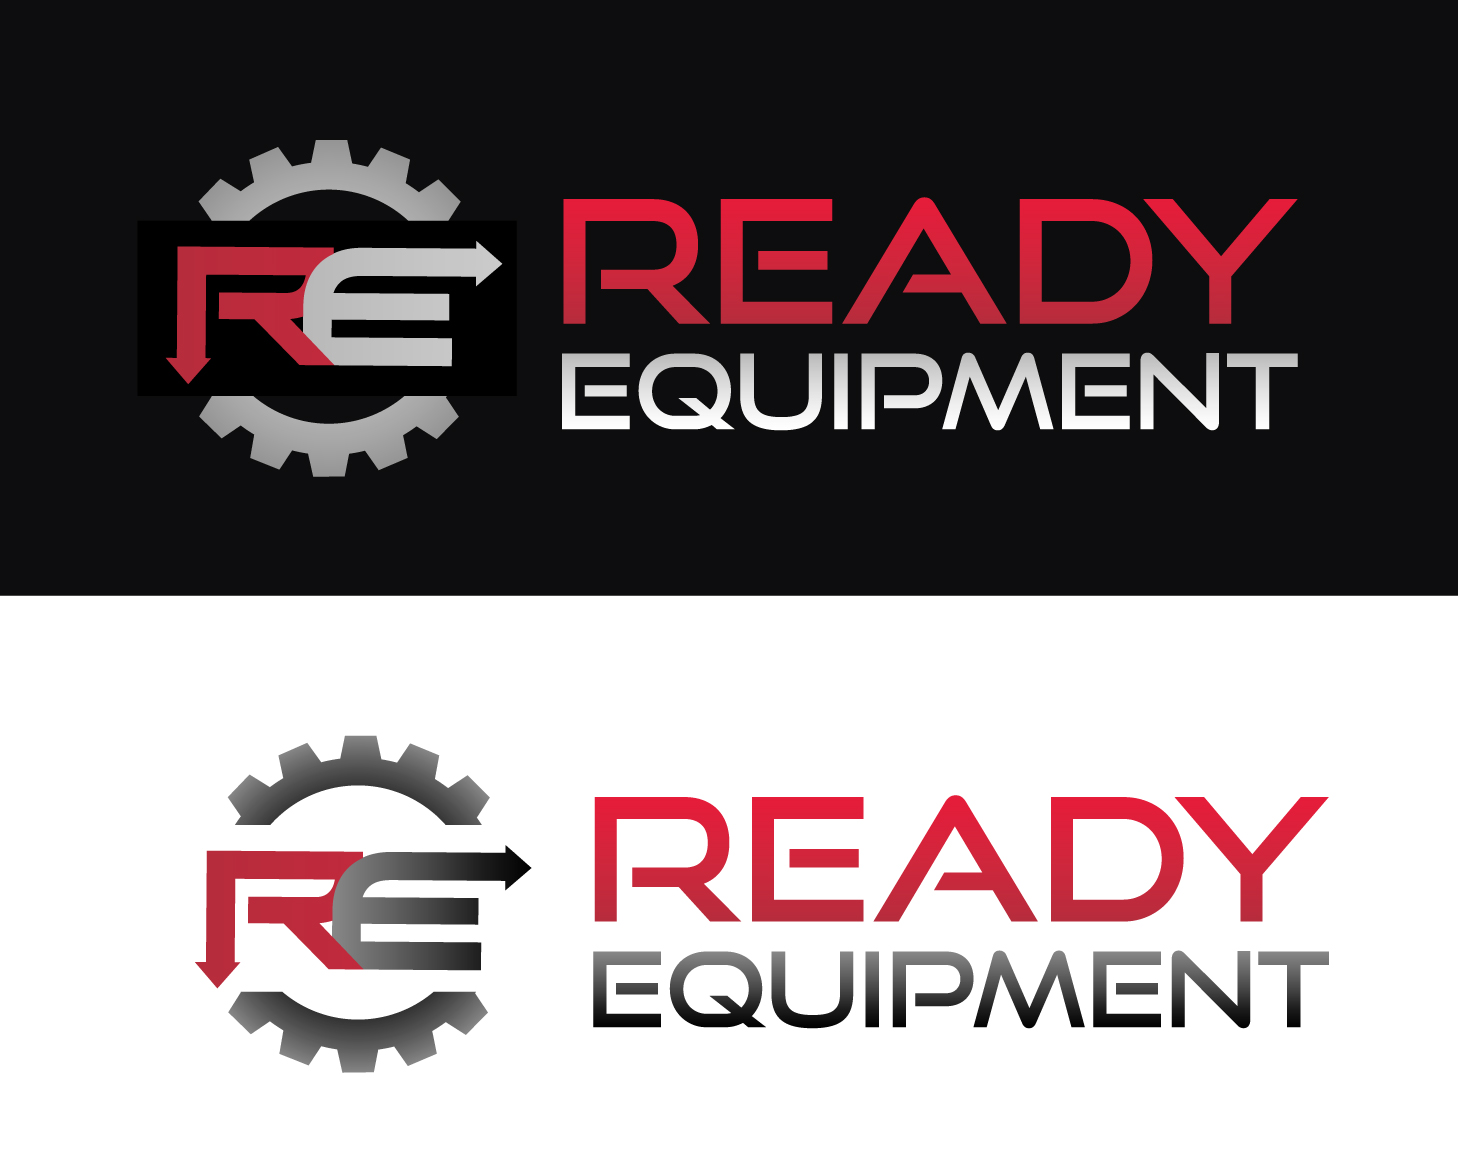 Logo Design by rA - Entry No. 174 in the Logo Design Contest Ready Equipment  Logo Design.